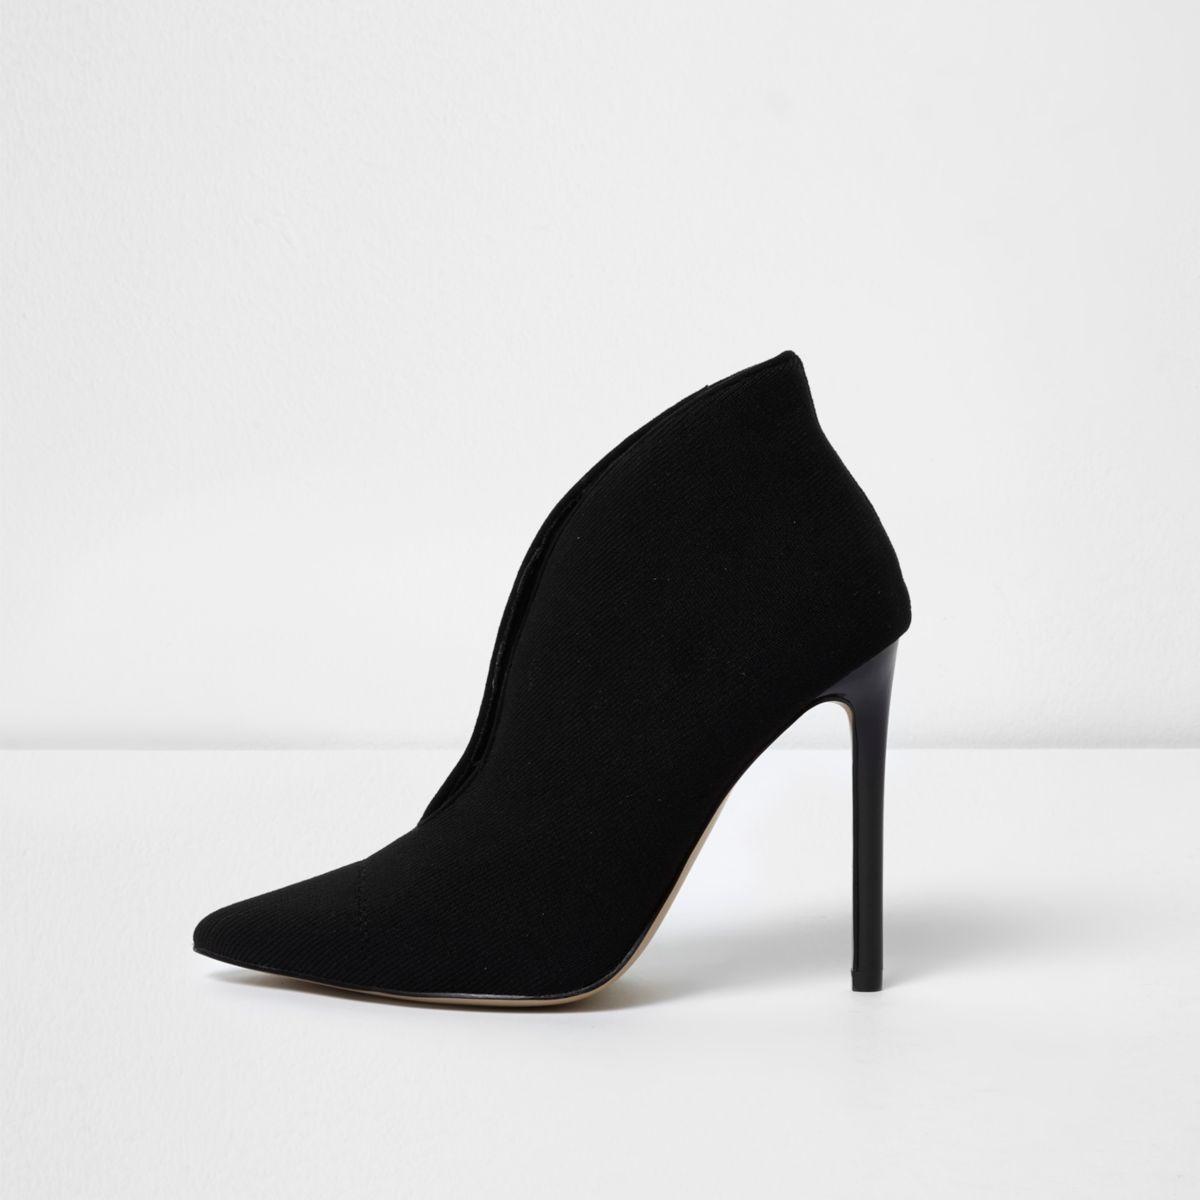 Black high vamp court shoes